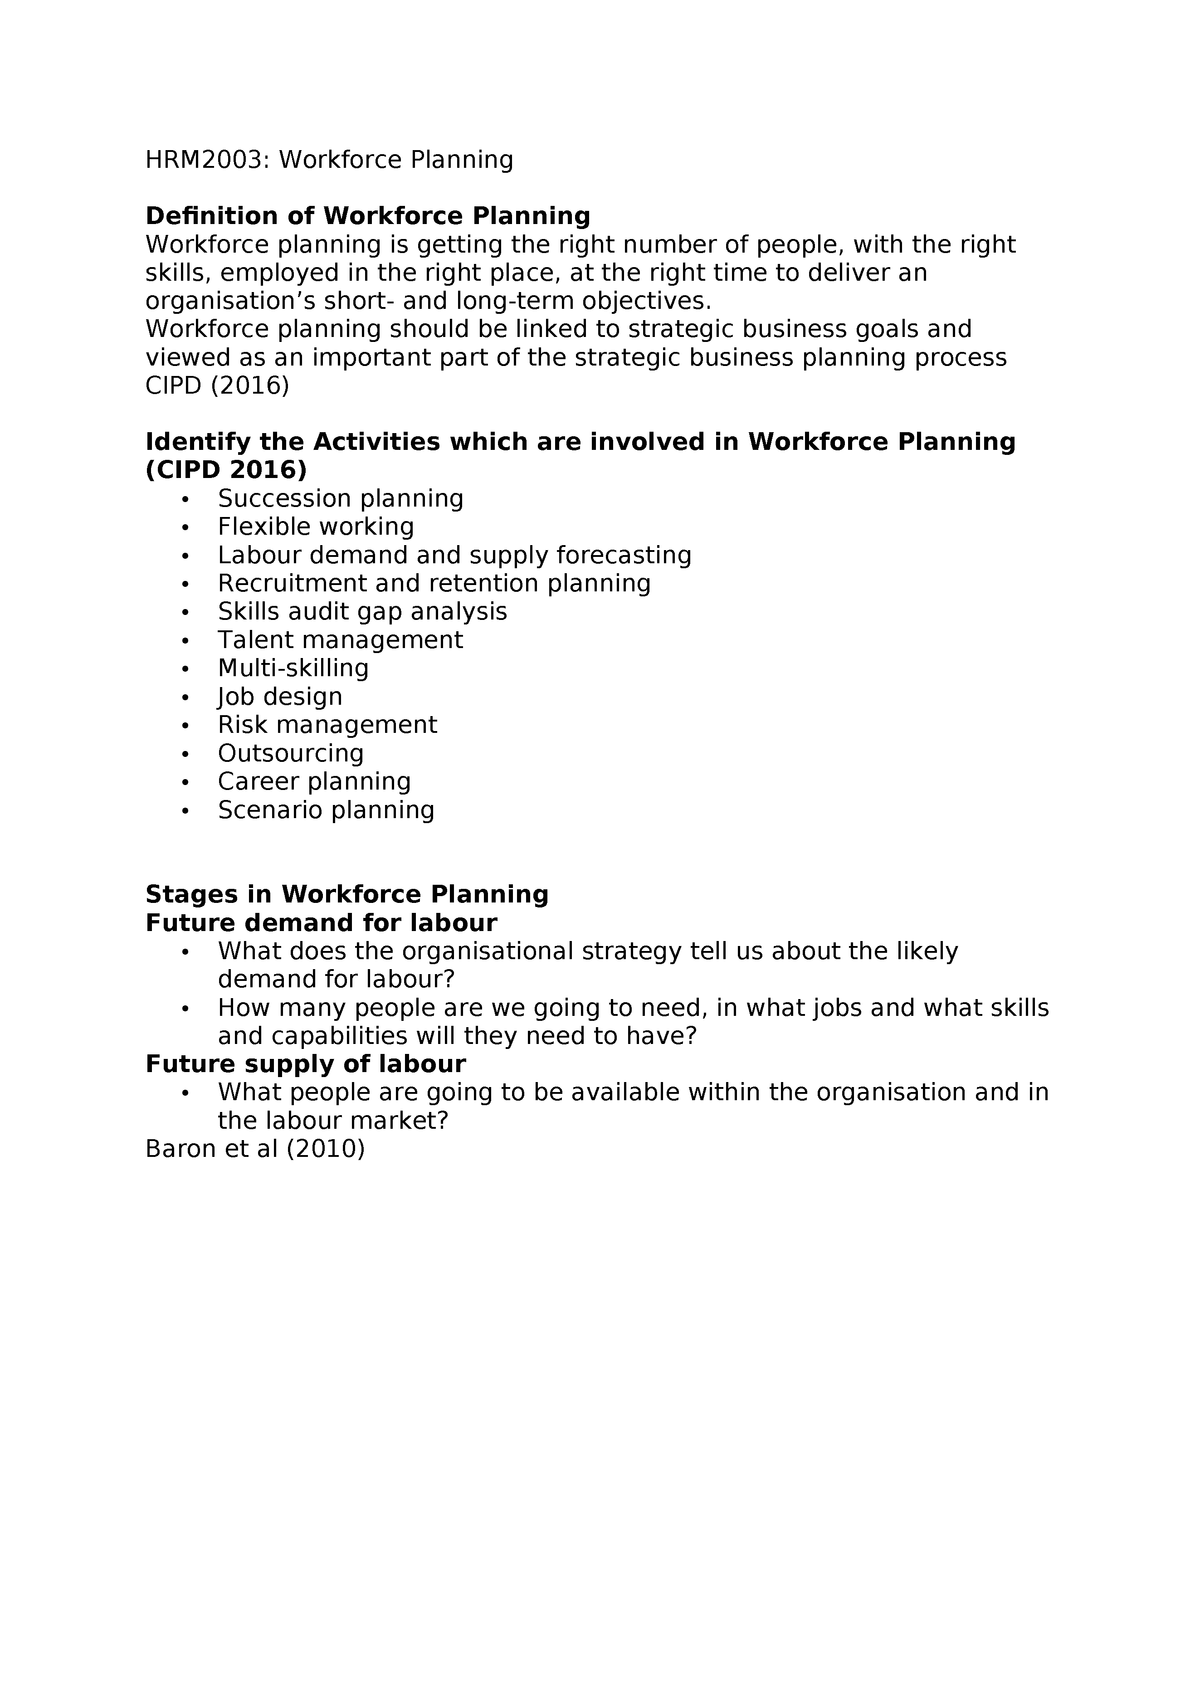 HRM2003 Workforce Planning - Managing Human Resources - StuDocu